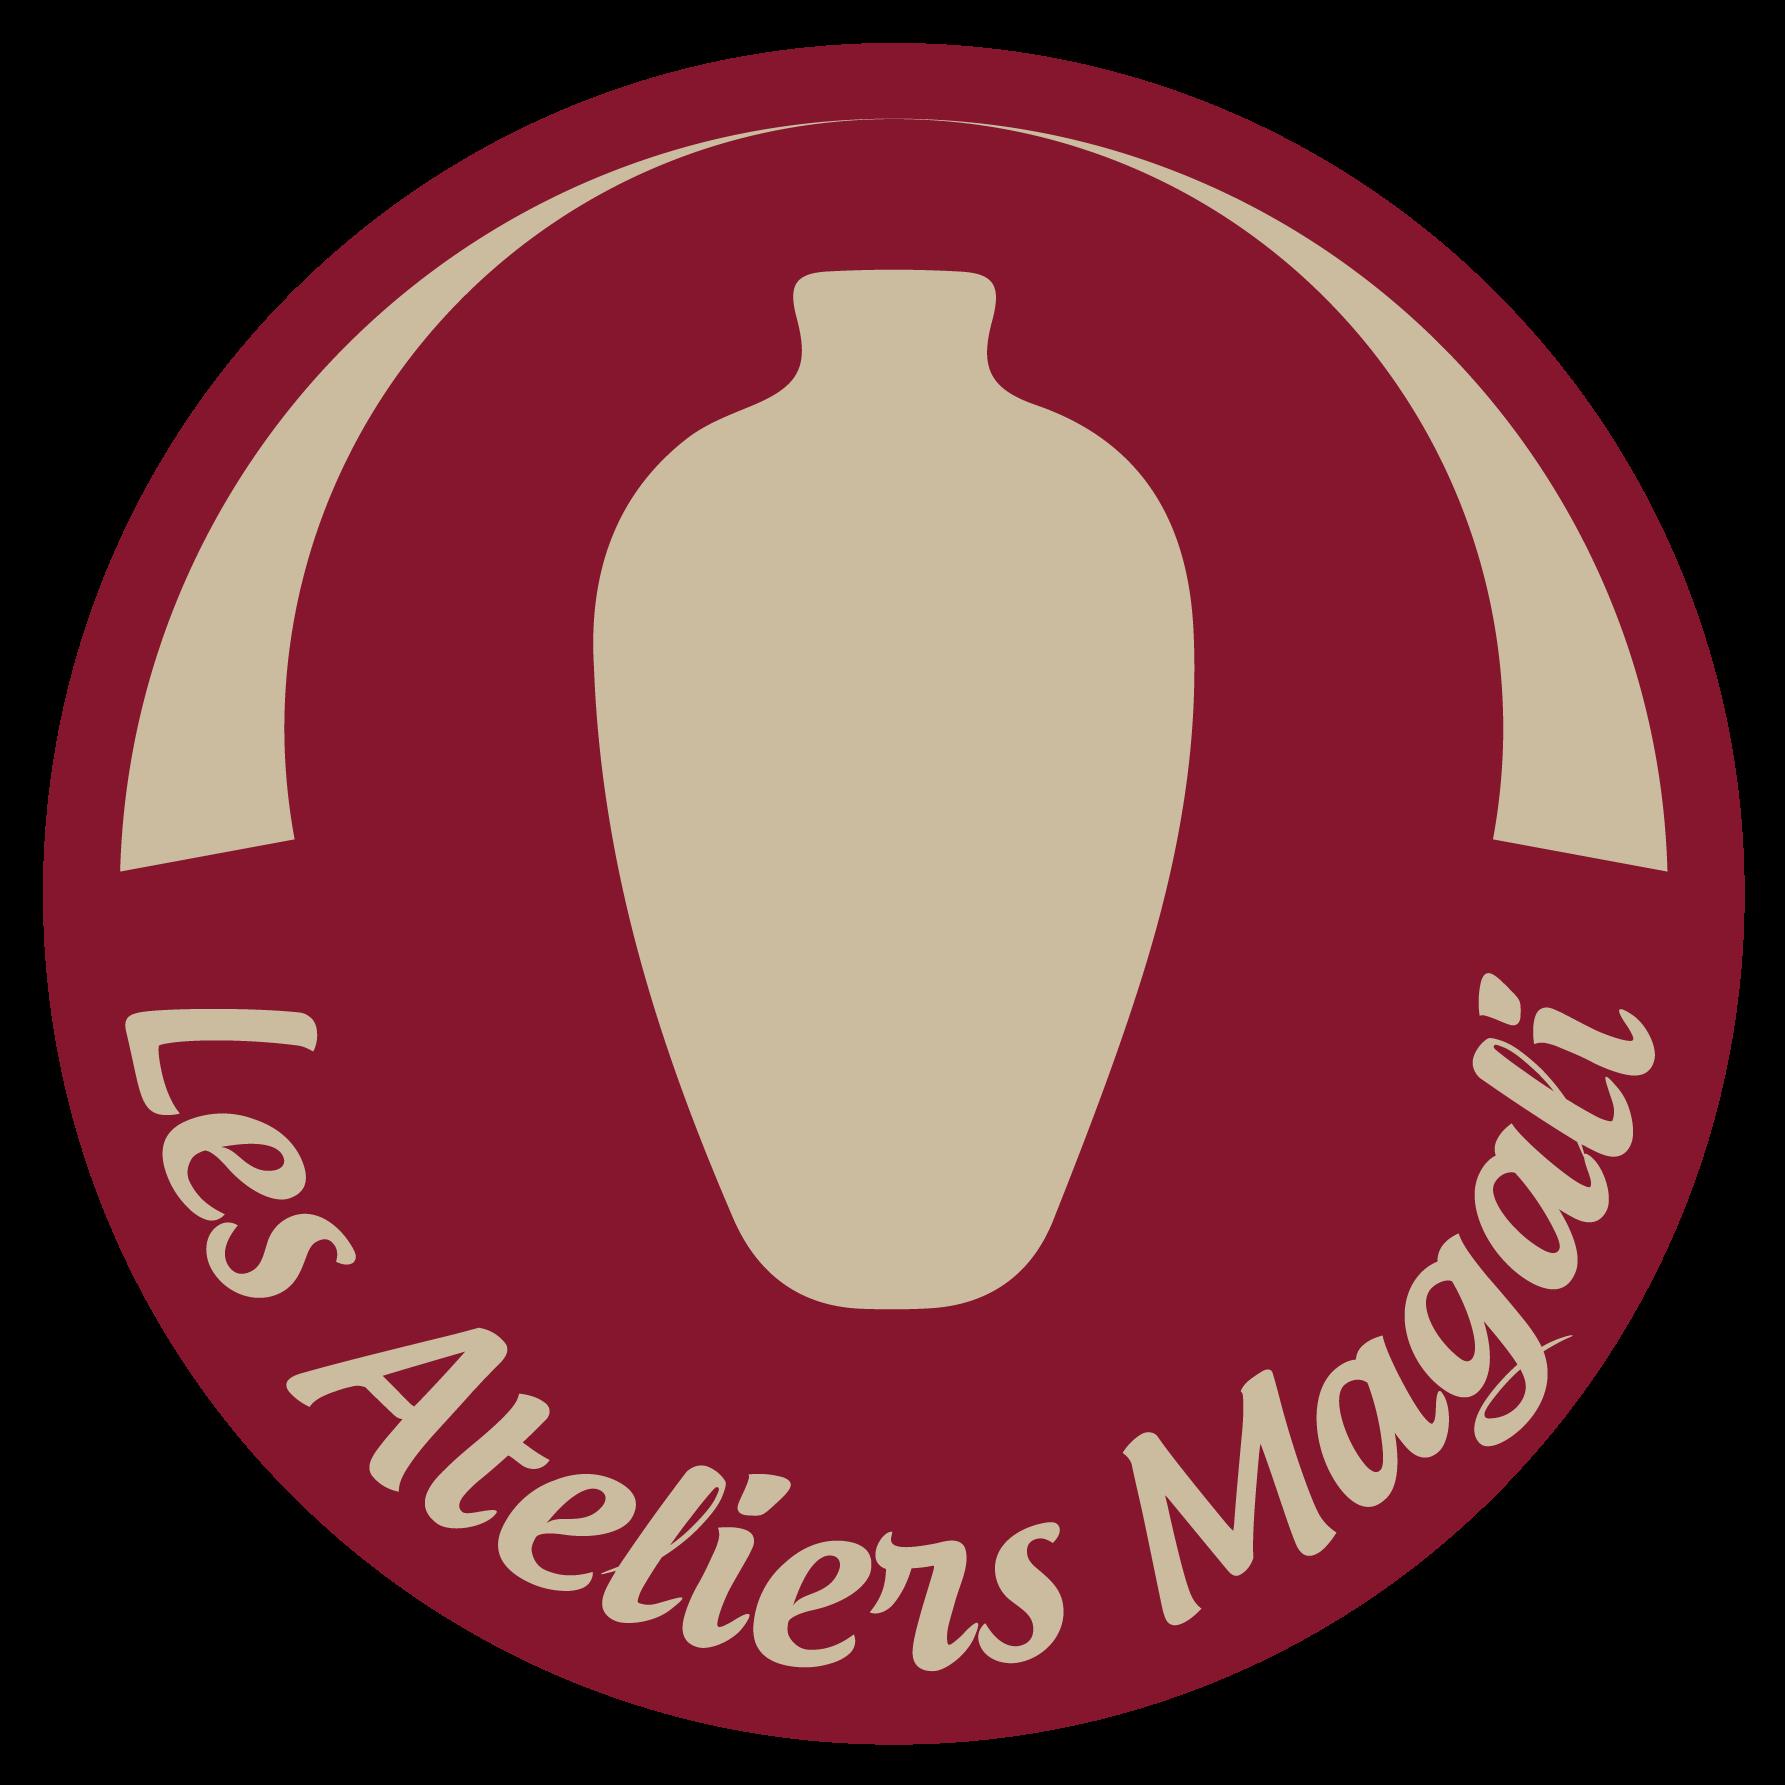 logo Les Ateliers Magali